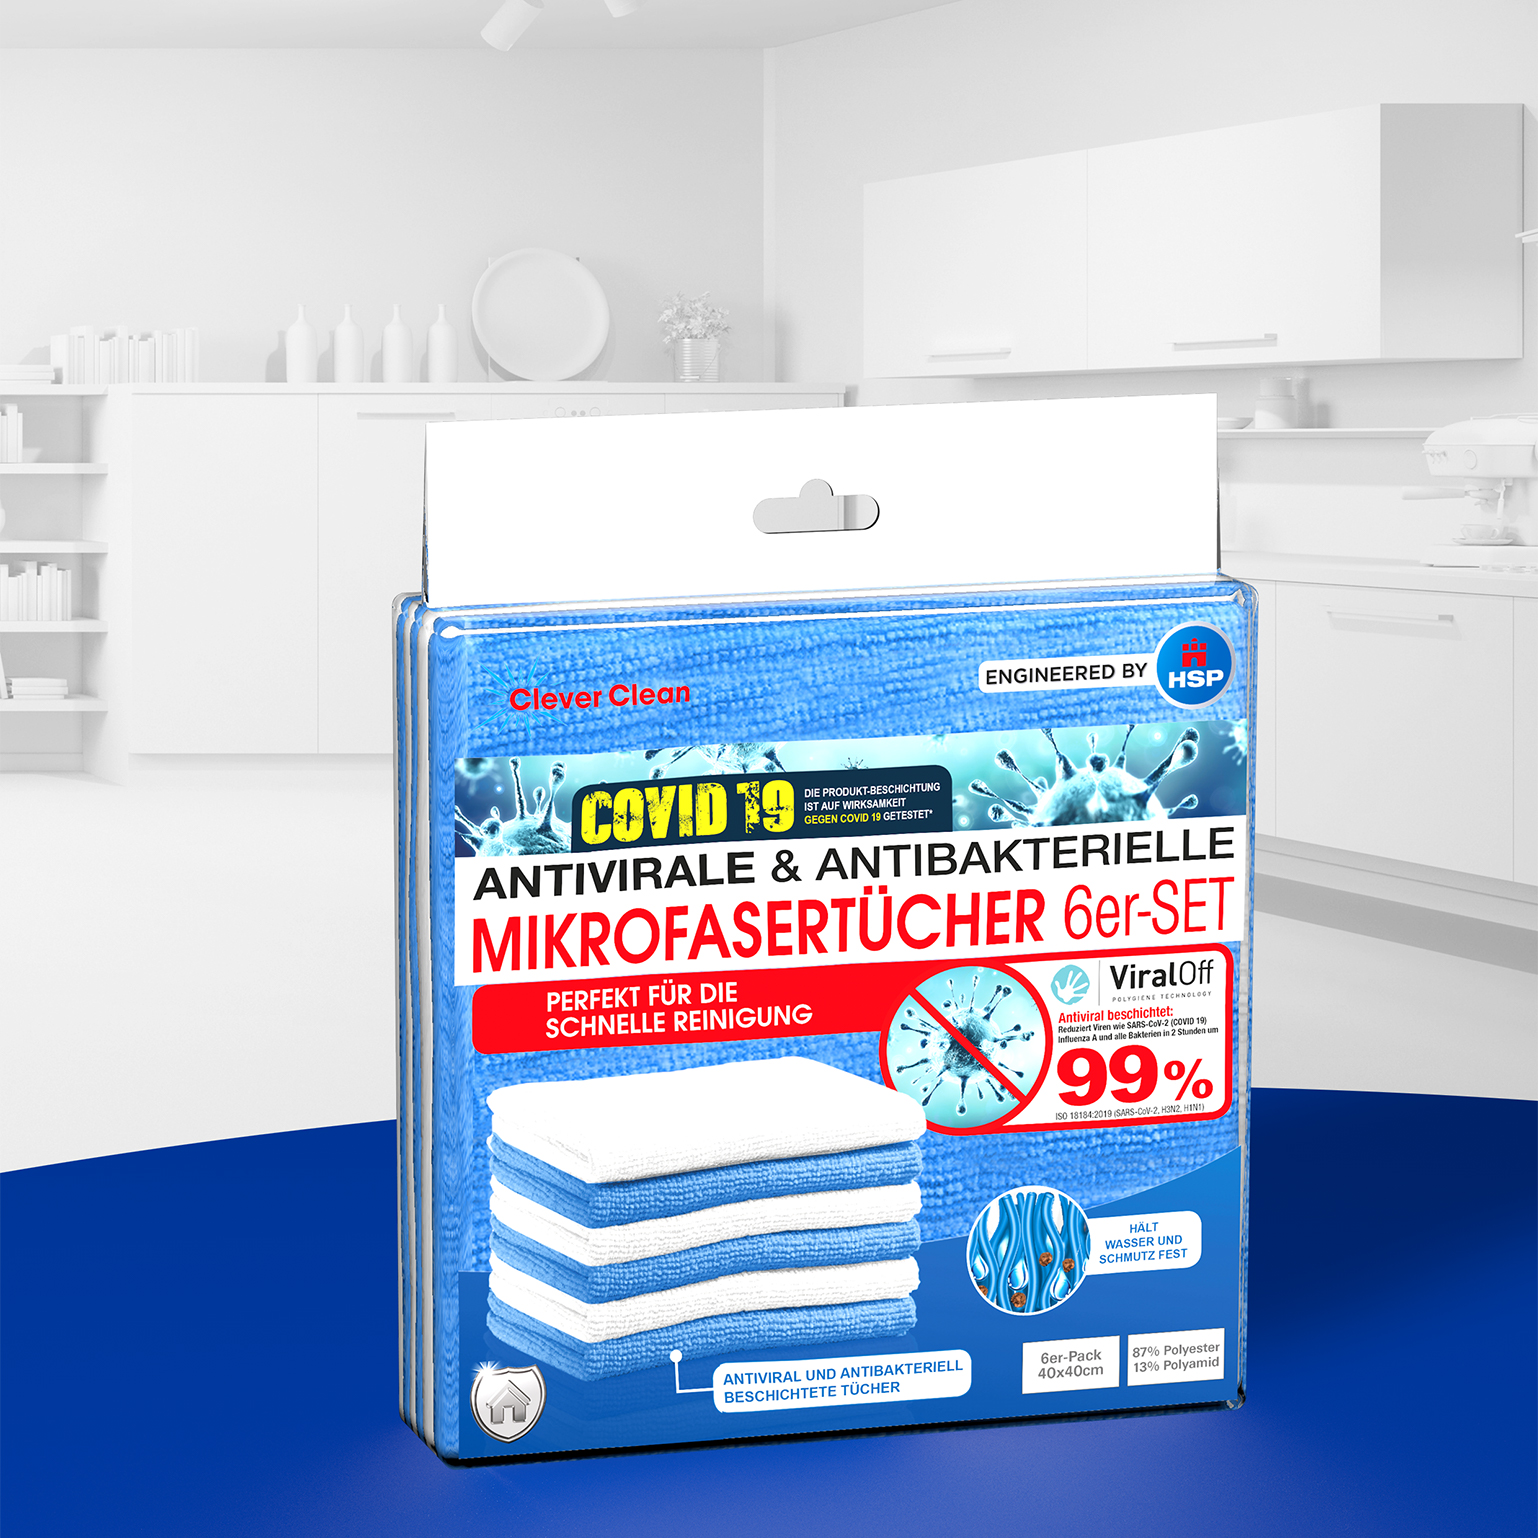 mikrotucher_antibakteriell-copy